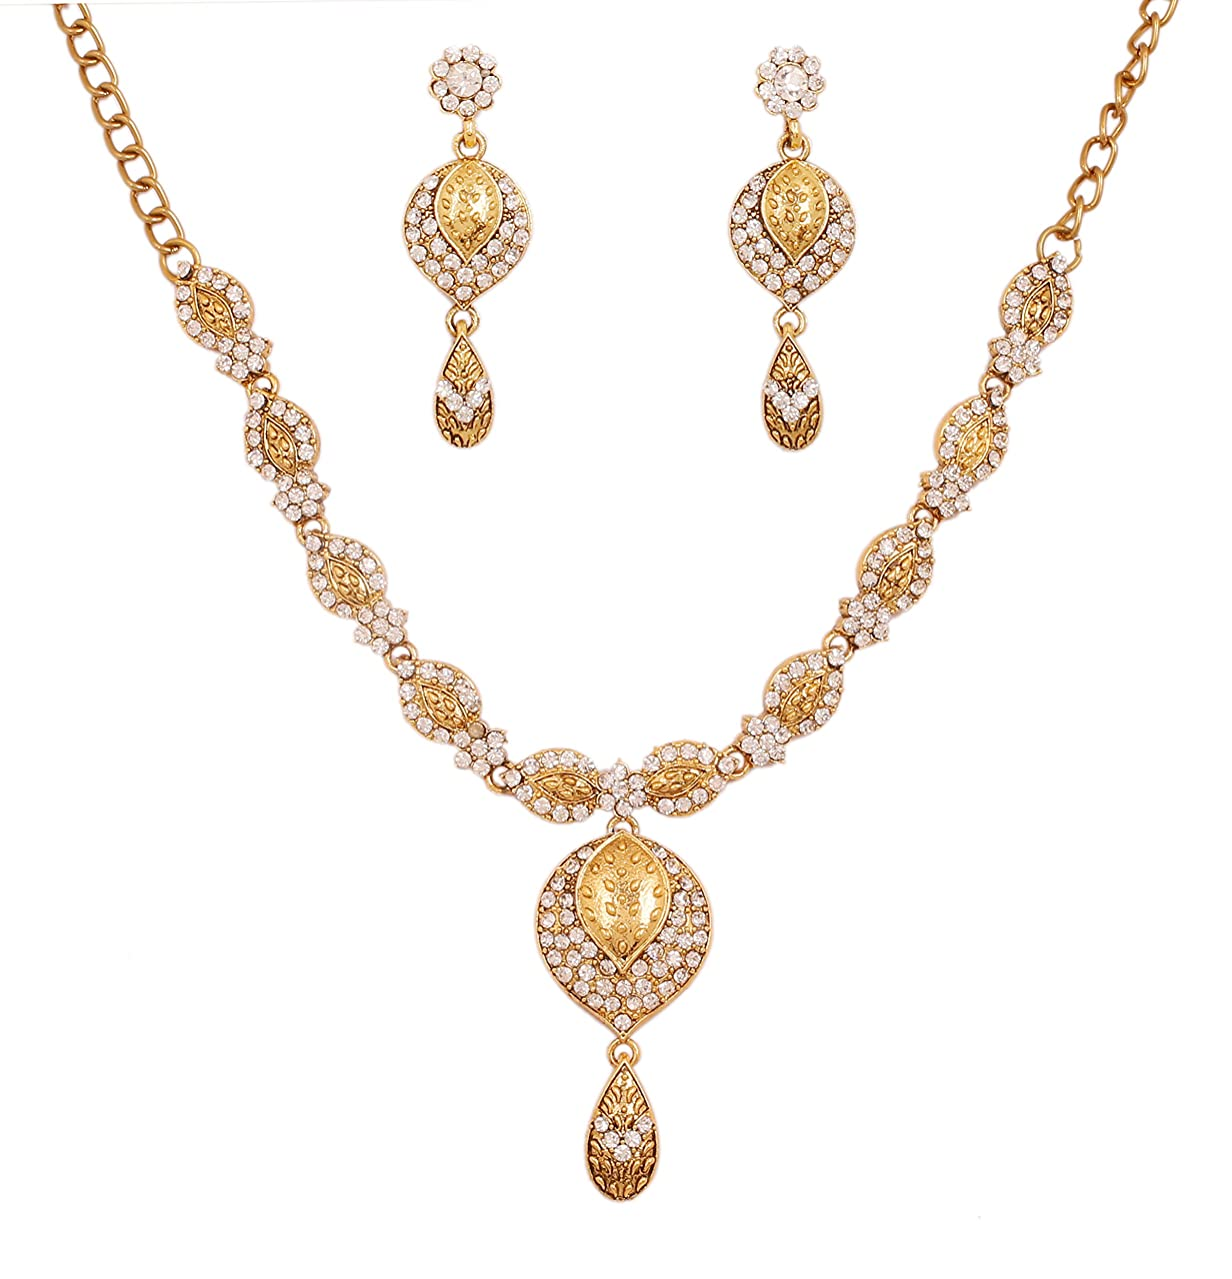 Touchstone Indian Bollywood fine Craftsmanship Gaudy White Rhinestones Jewelry Necklace Set for Women